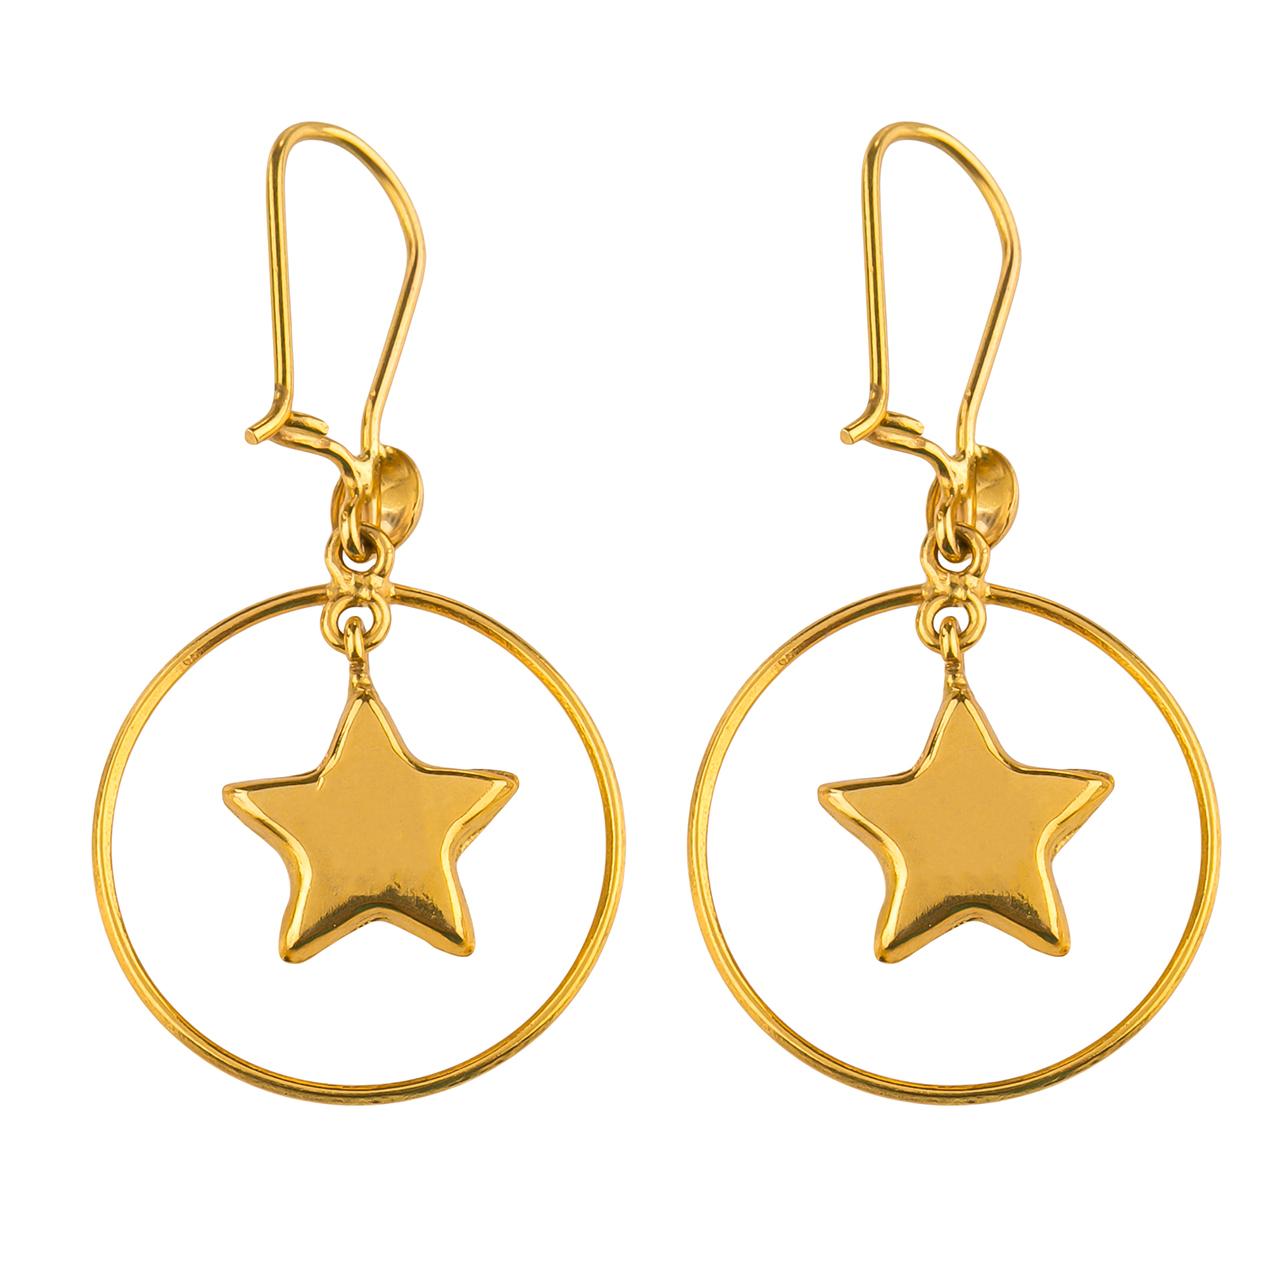 گوشواره طلا 18عیار گالری طلاچی مدل آویز ستاره و حلقه